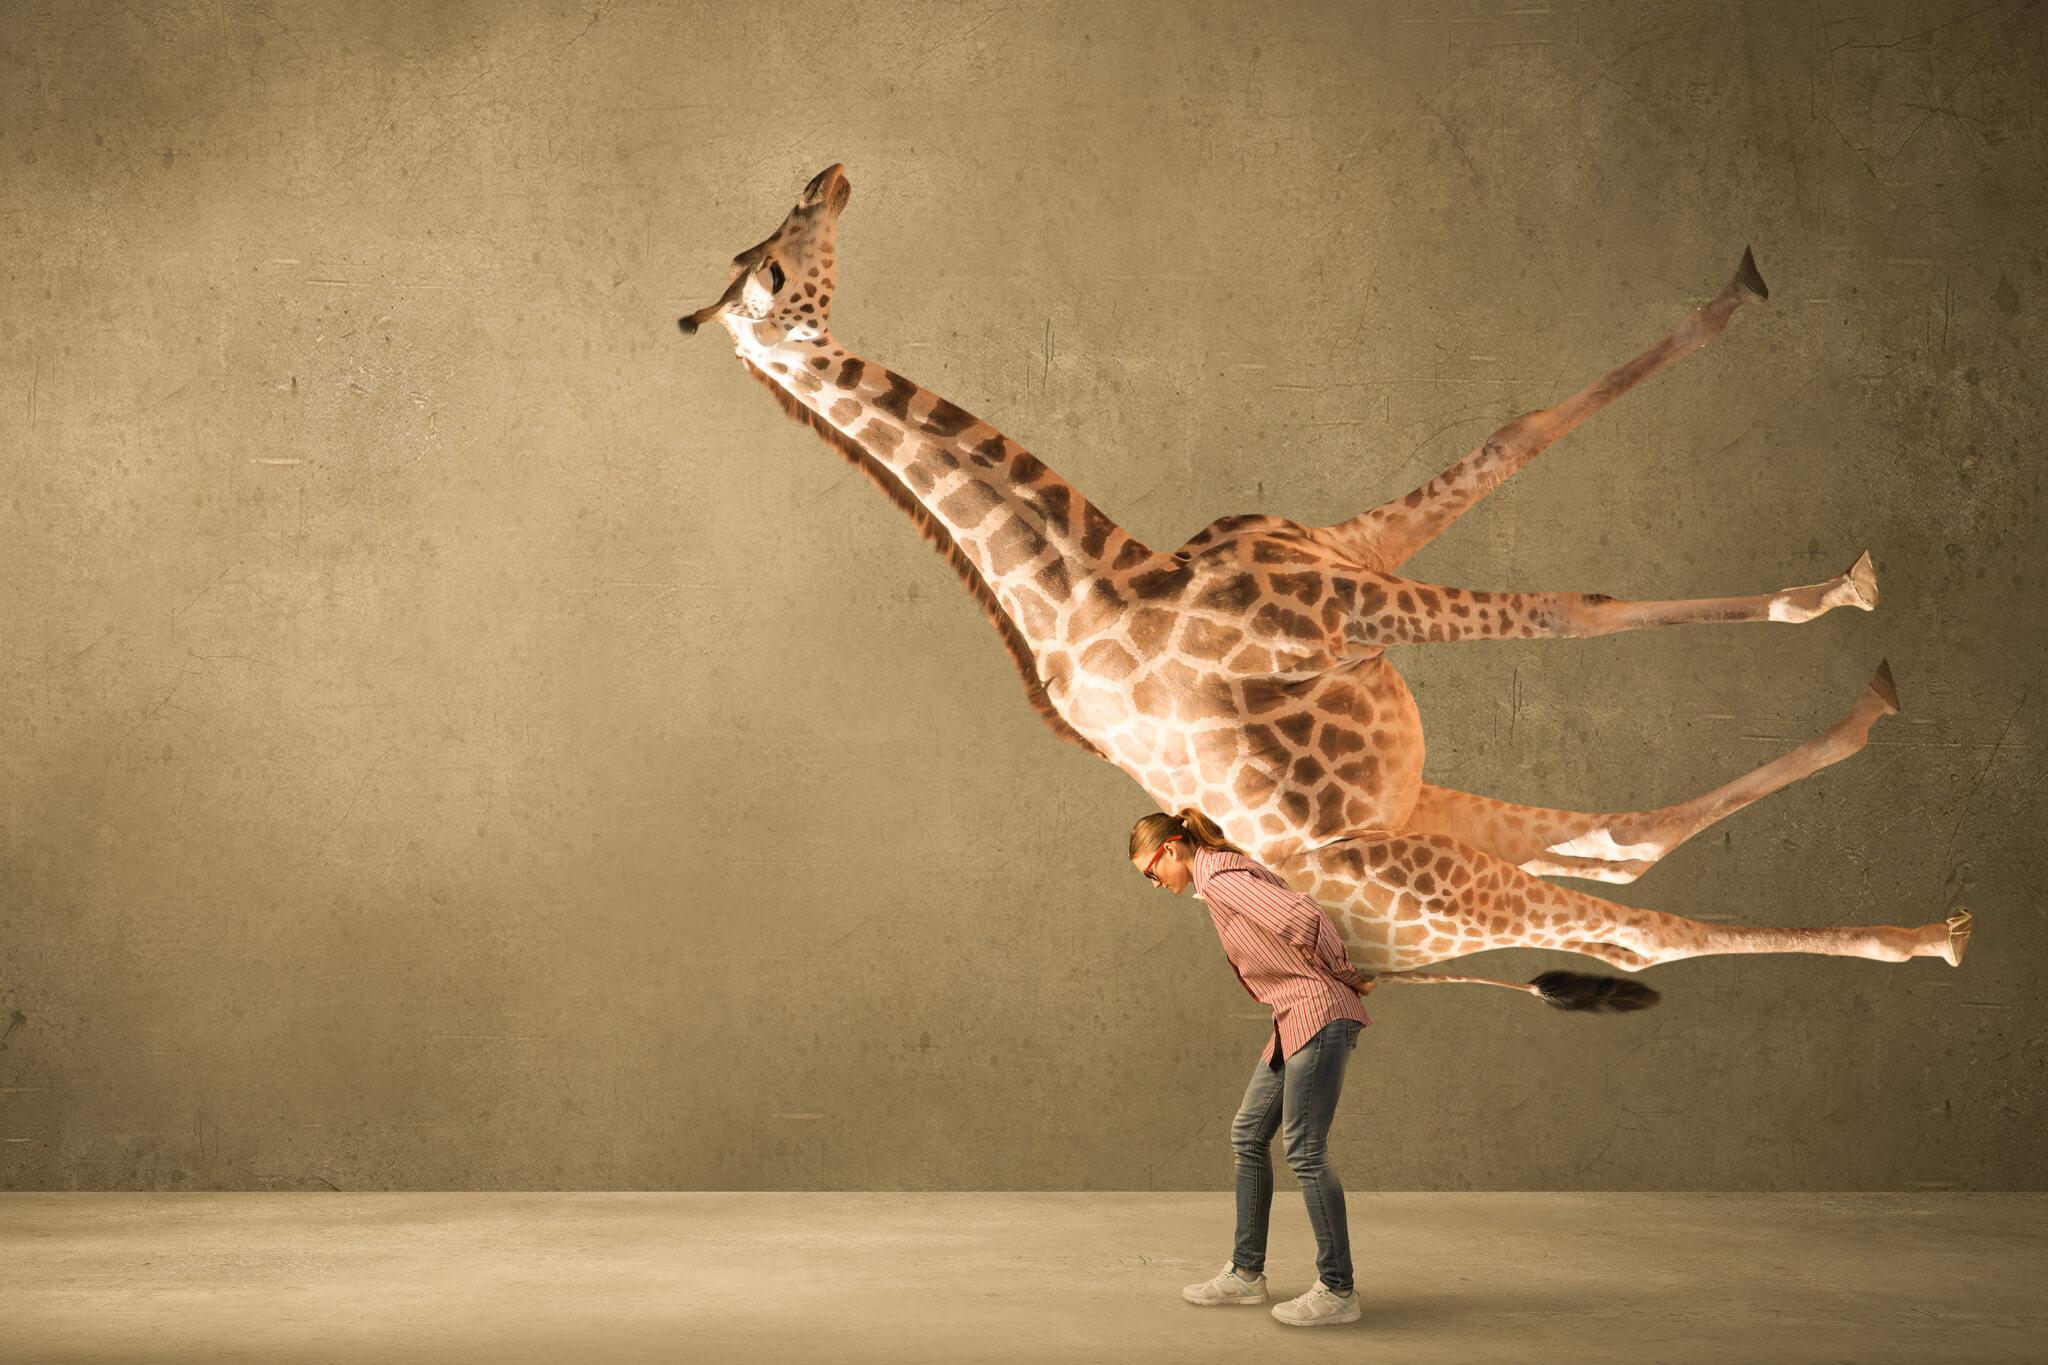 Giraffensprache-kommunikationsfallen